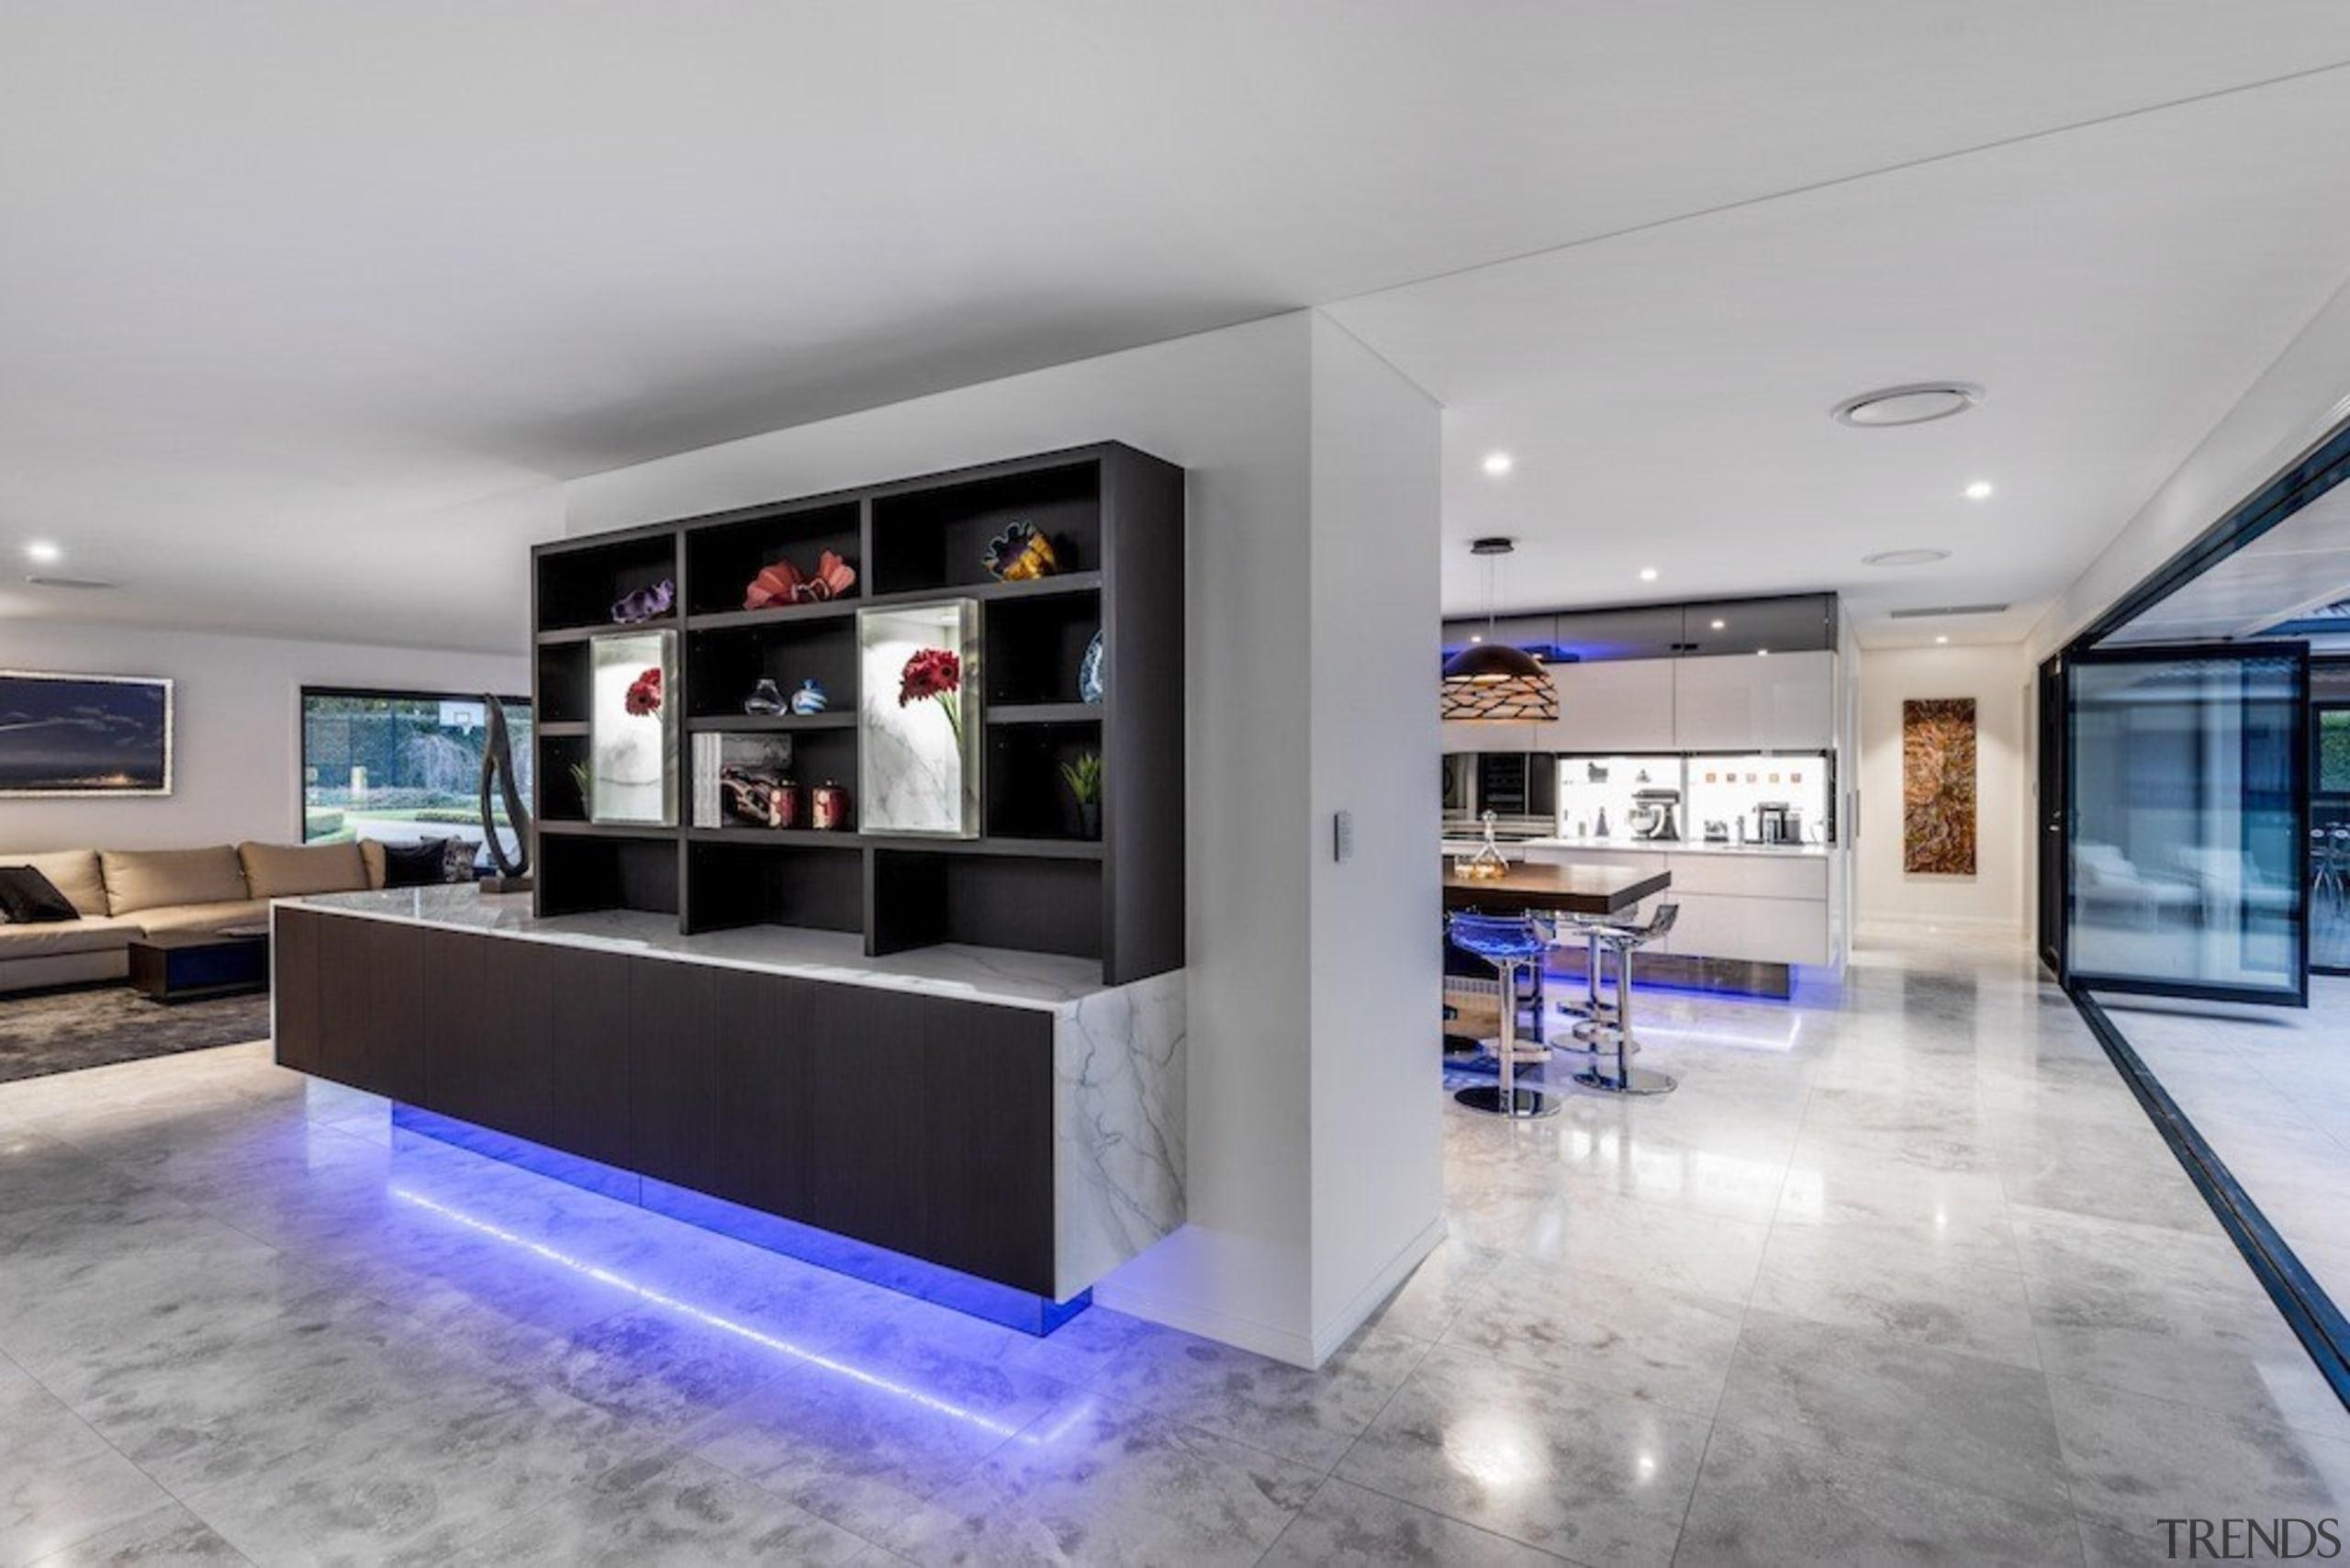 A focus on lighting – Kitchen by designer interior design, lobby, real estate, gray